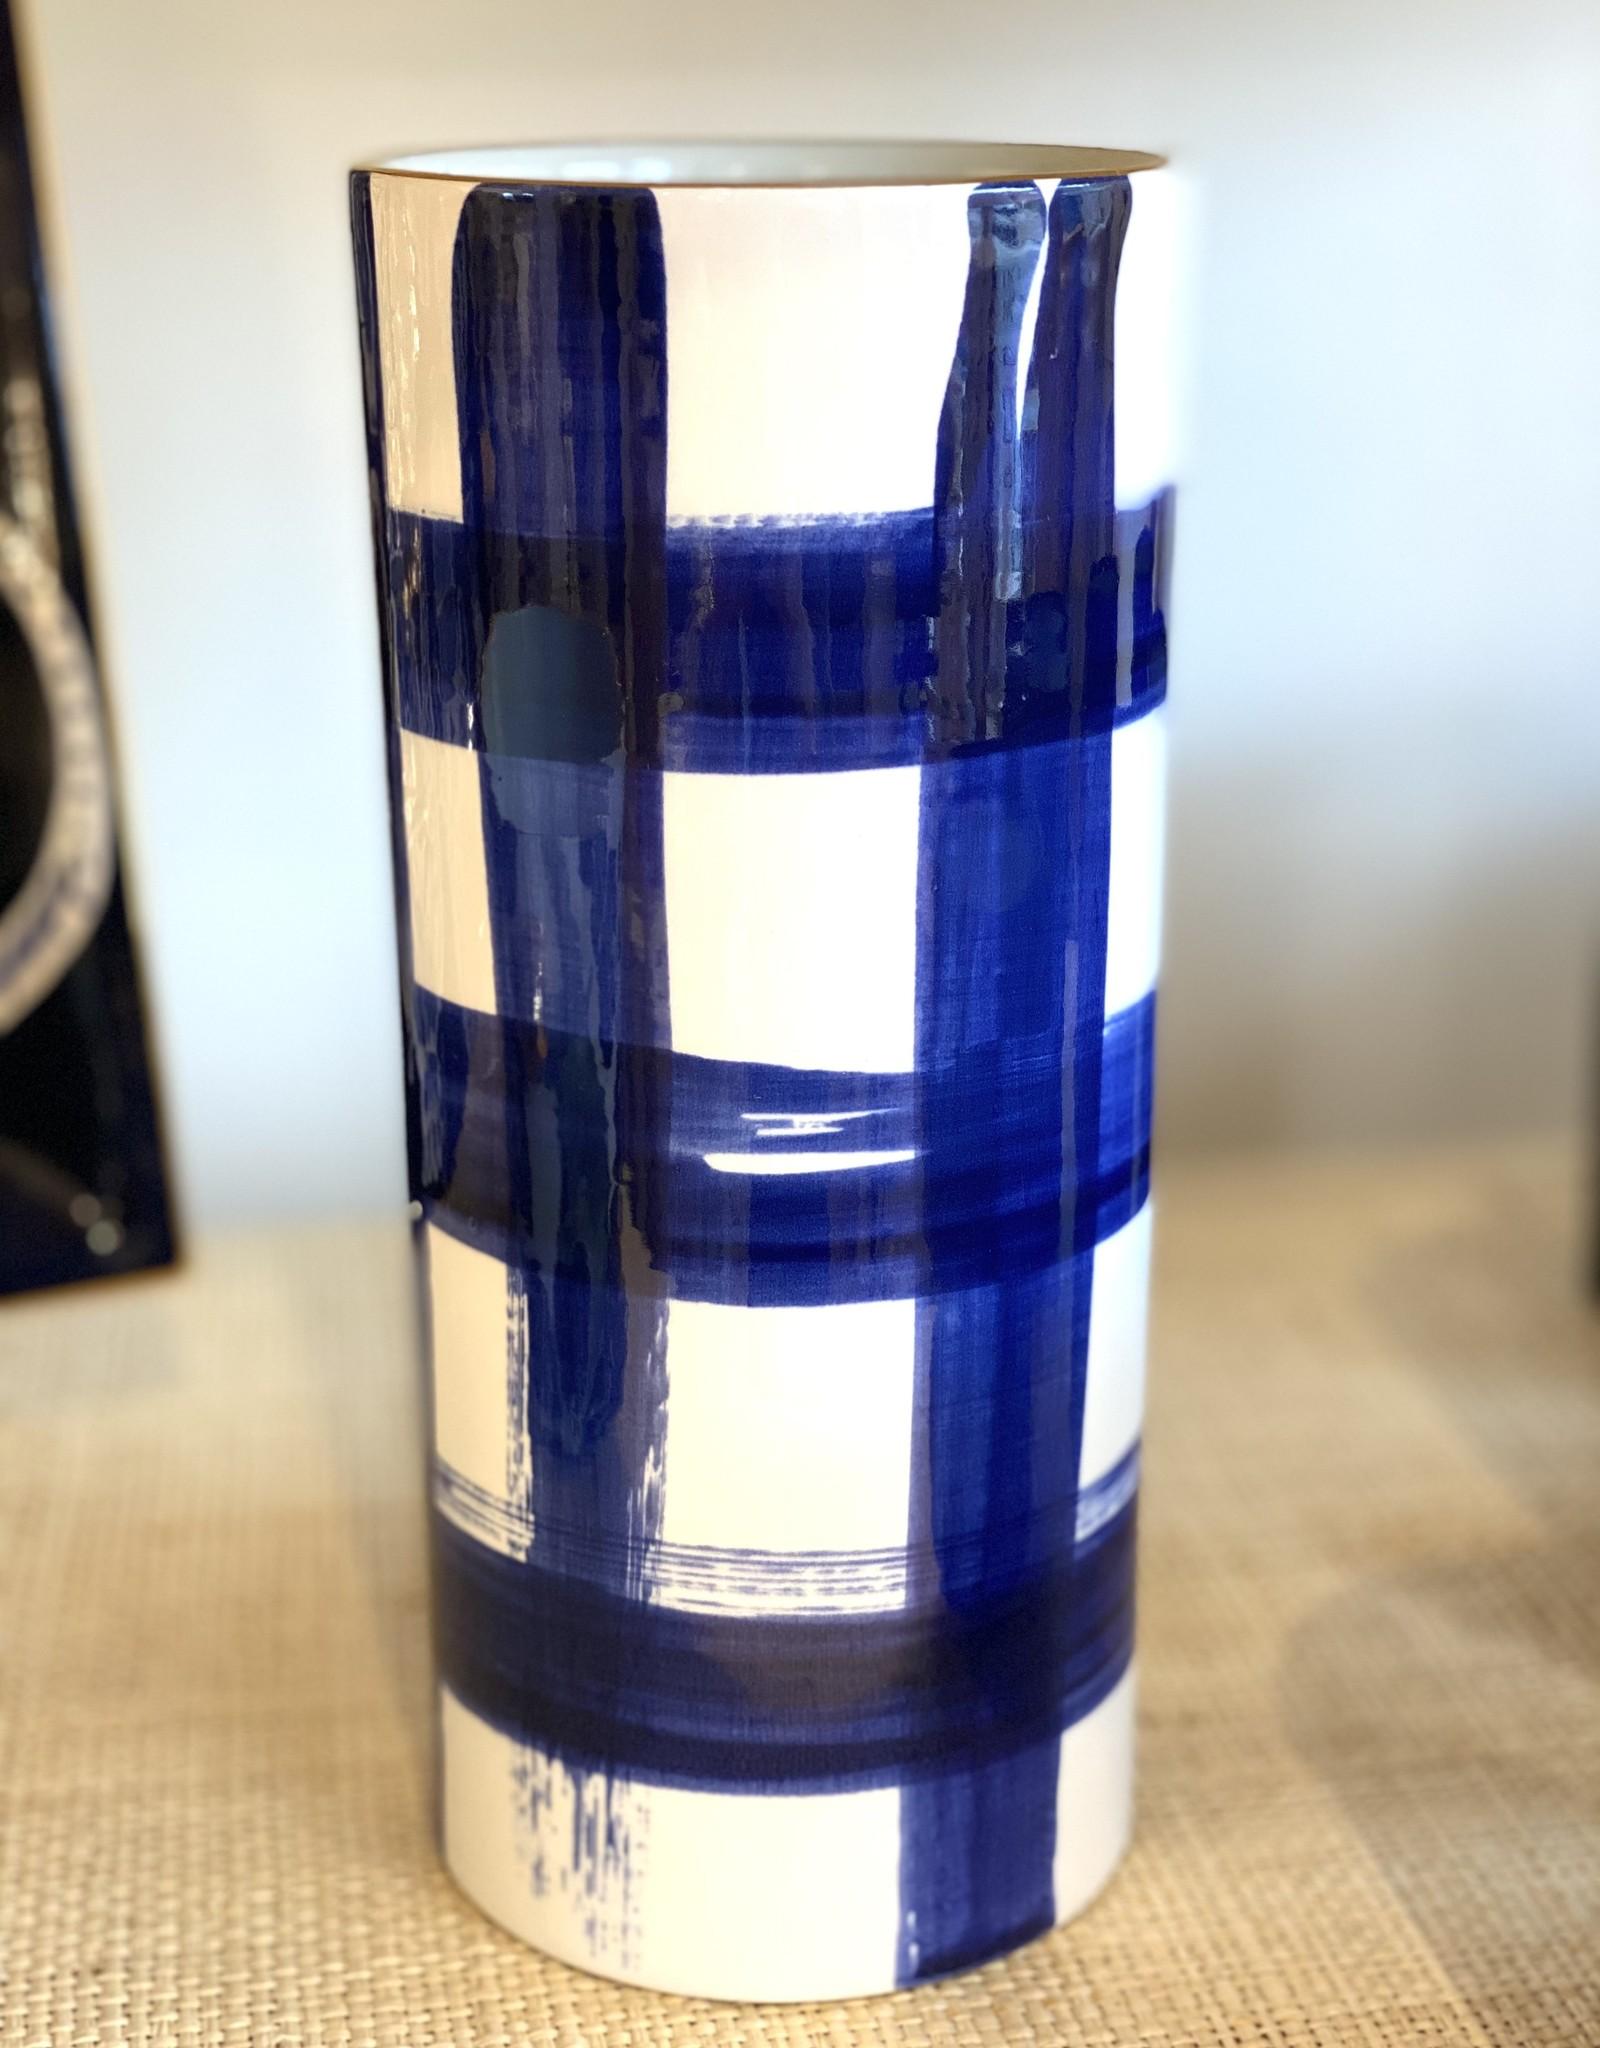 Jill Rosenwald #8 Cylinder Vase - Brooks Plaid/Delft